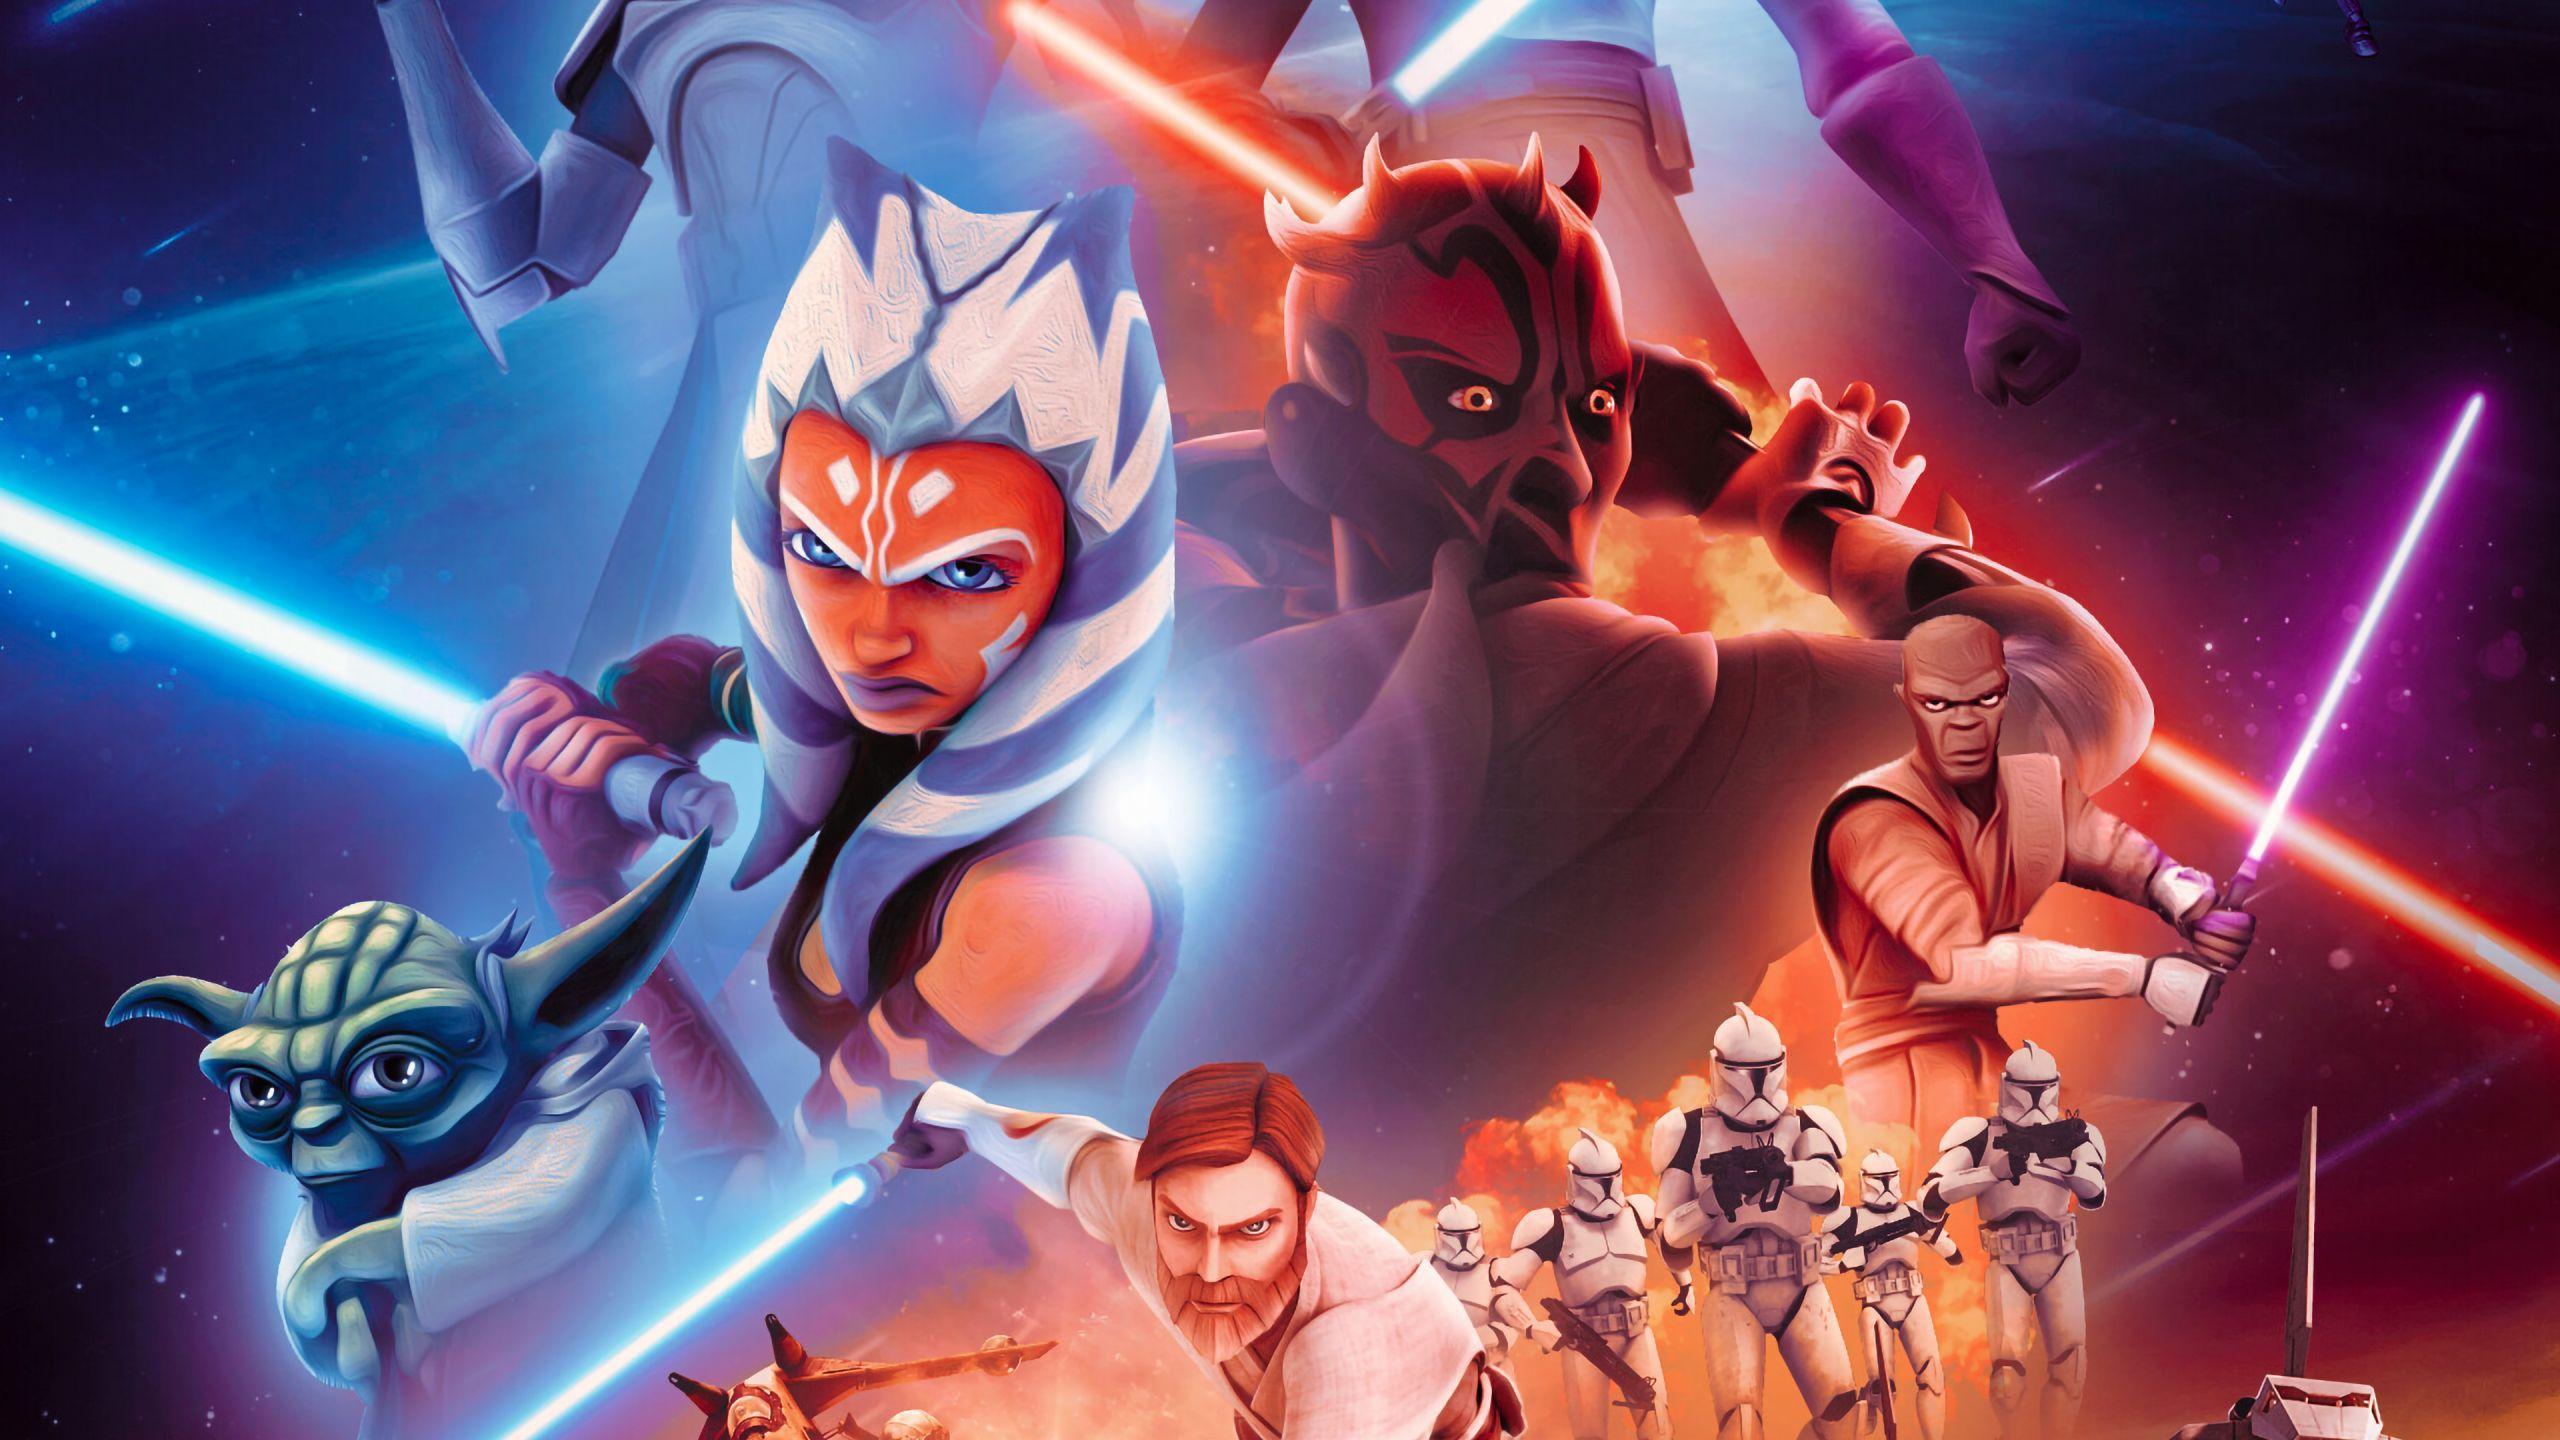 Star Wars Clones Hd Wallpapers Top Free Star Wars Clones Hd Backgrounds Wallpaperaccess